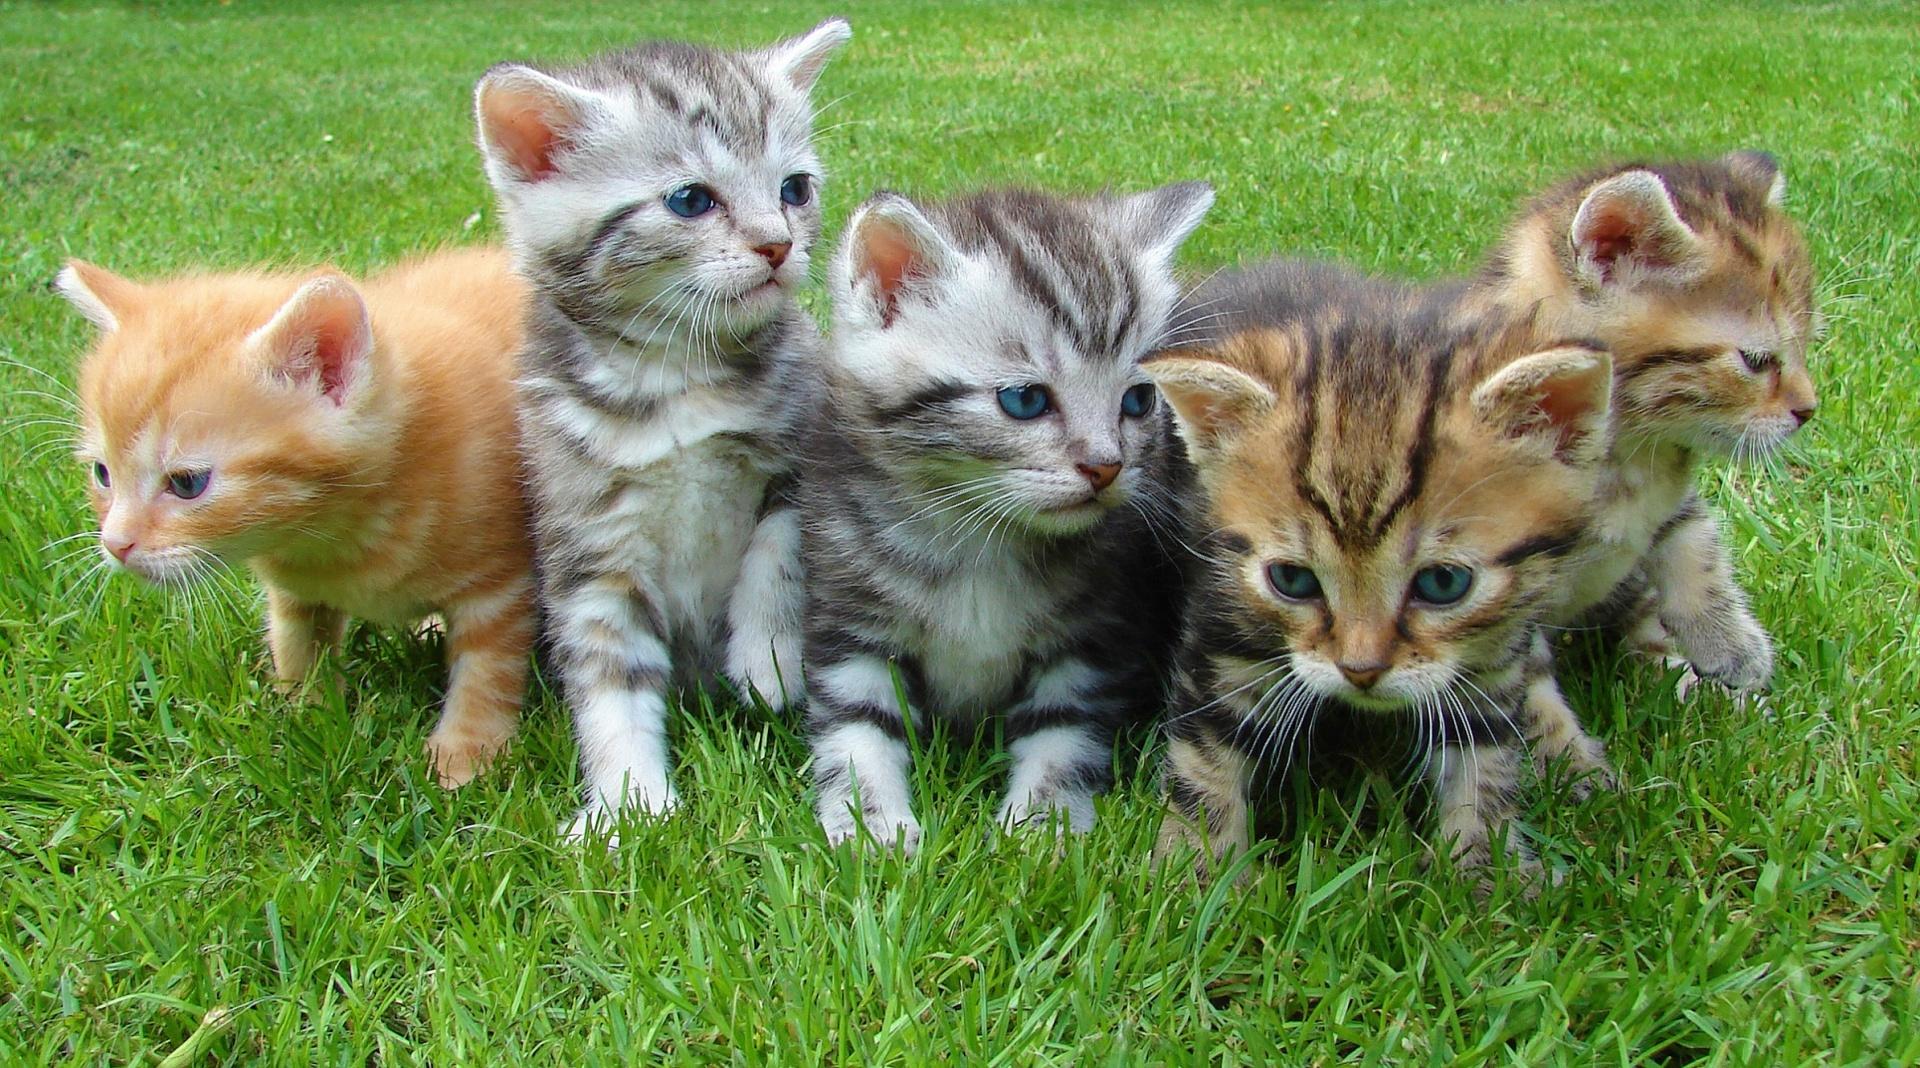 20 photos d'adorables chatons